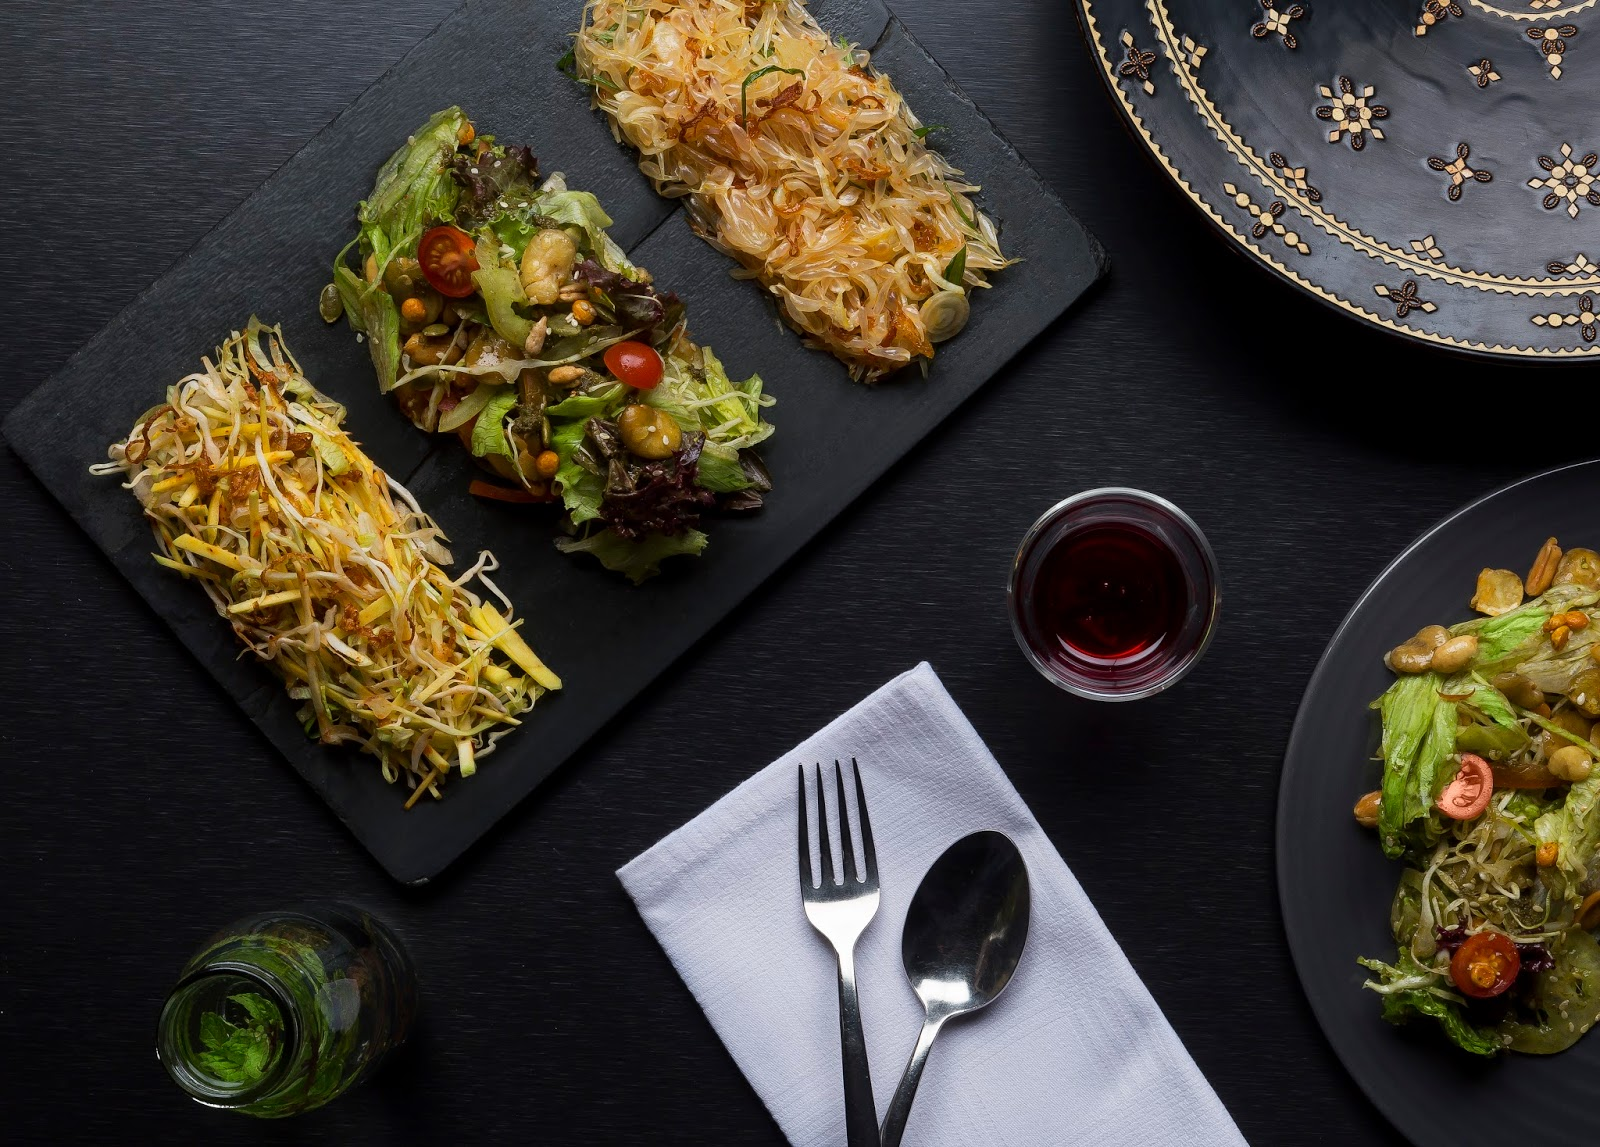 Dining at burma burma a new wholesome and innovative casual salad sampler at burma burma forumfinder Gallery